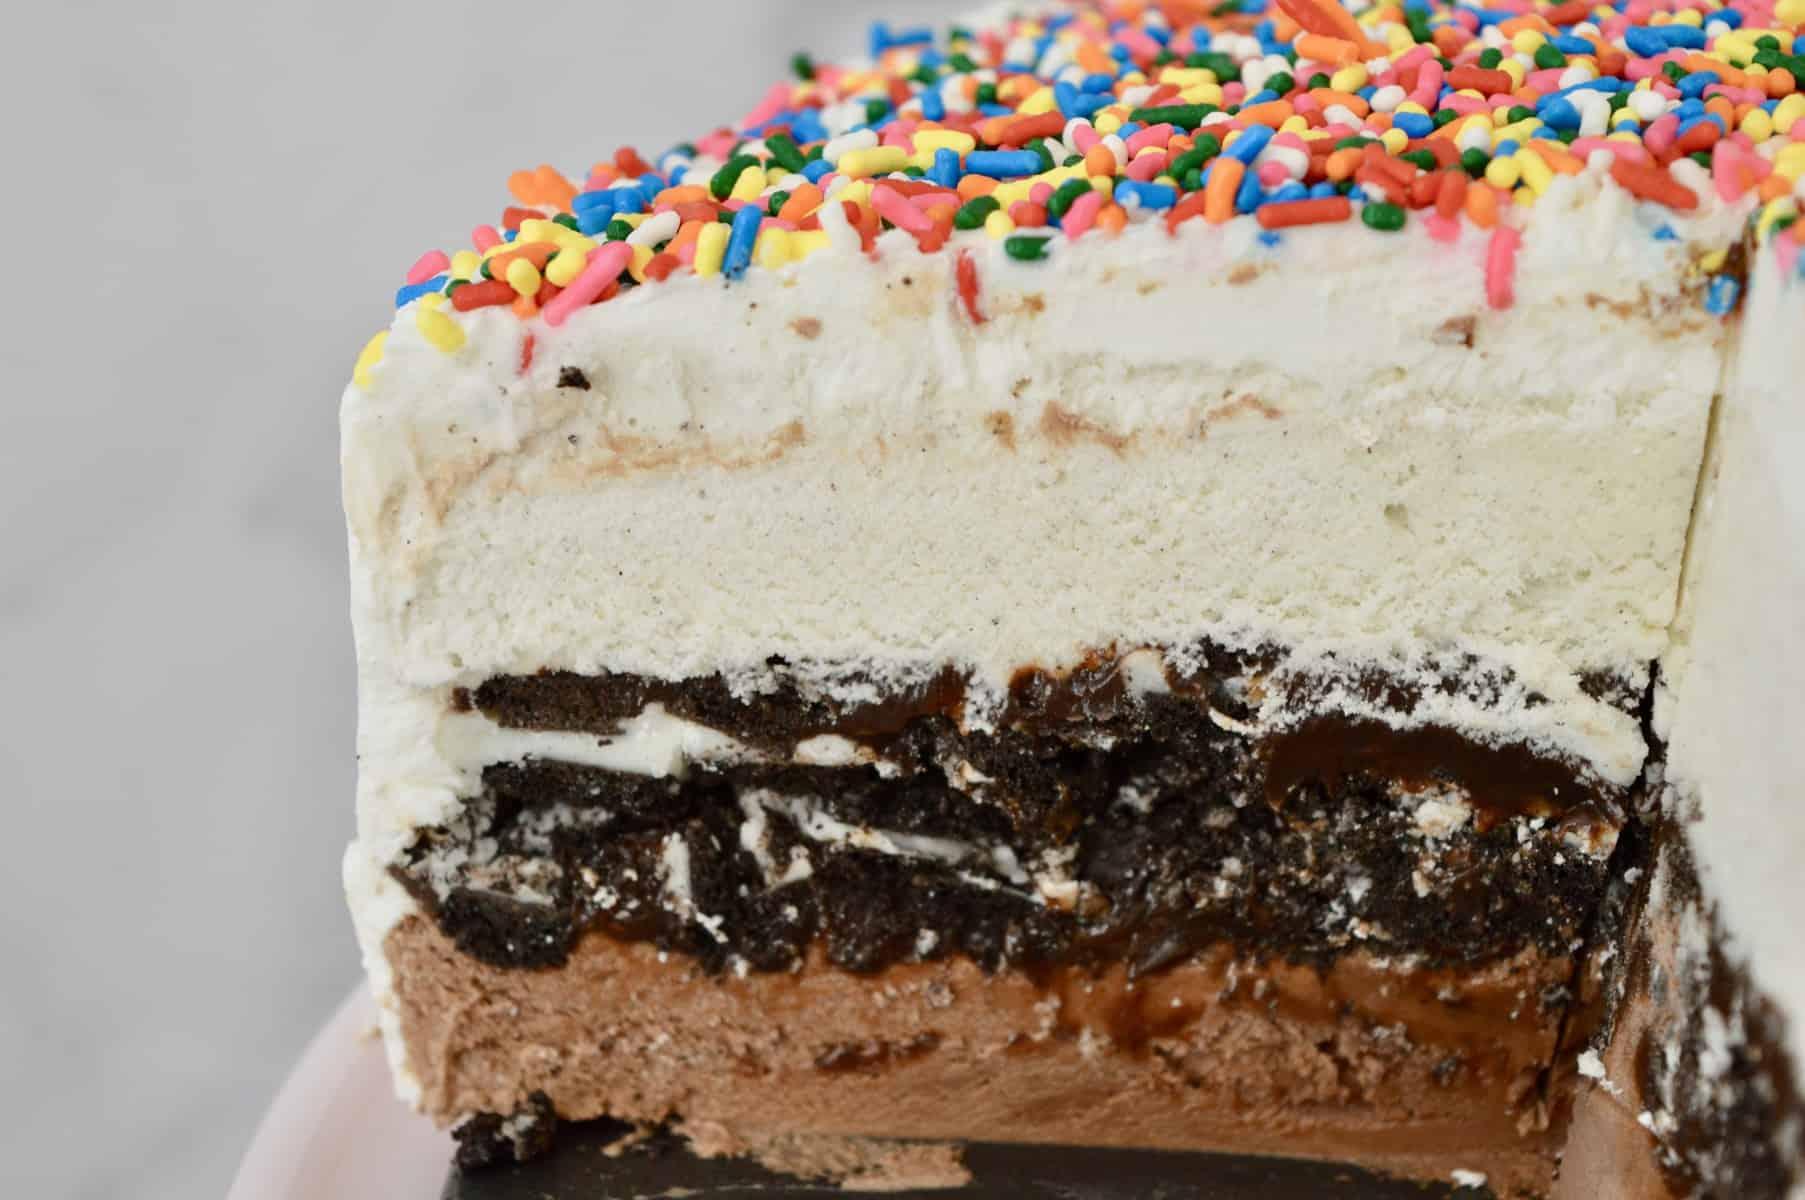 slice of ice cream cake.